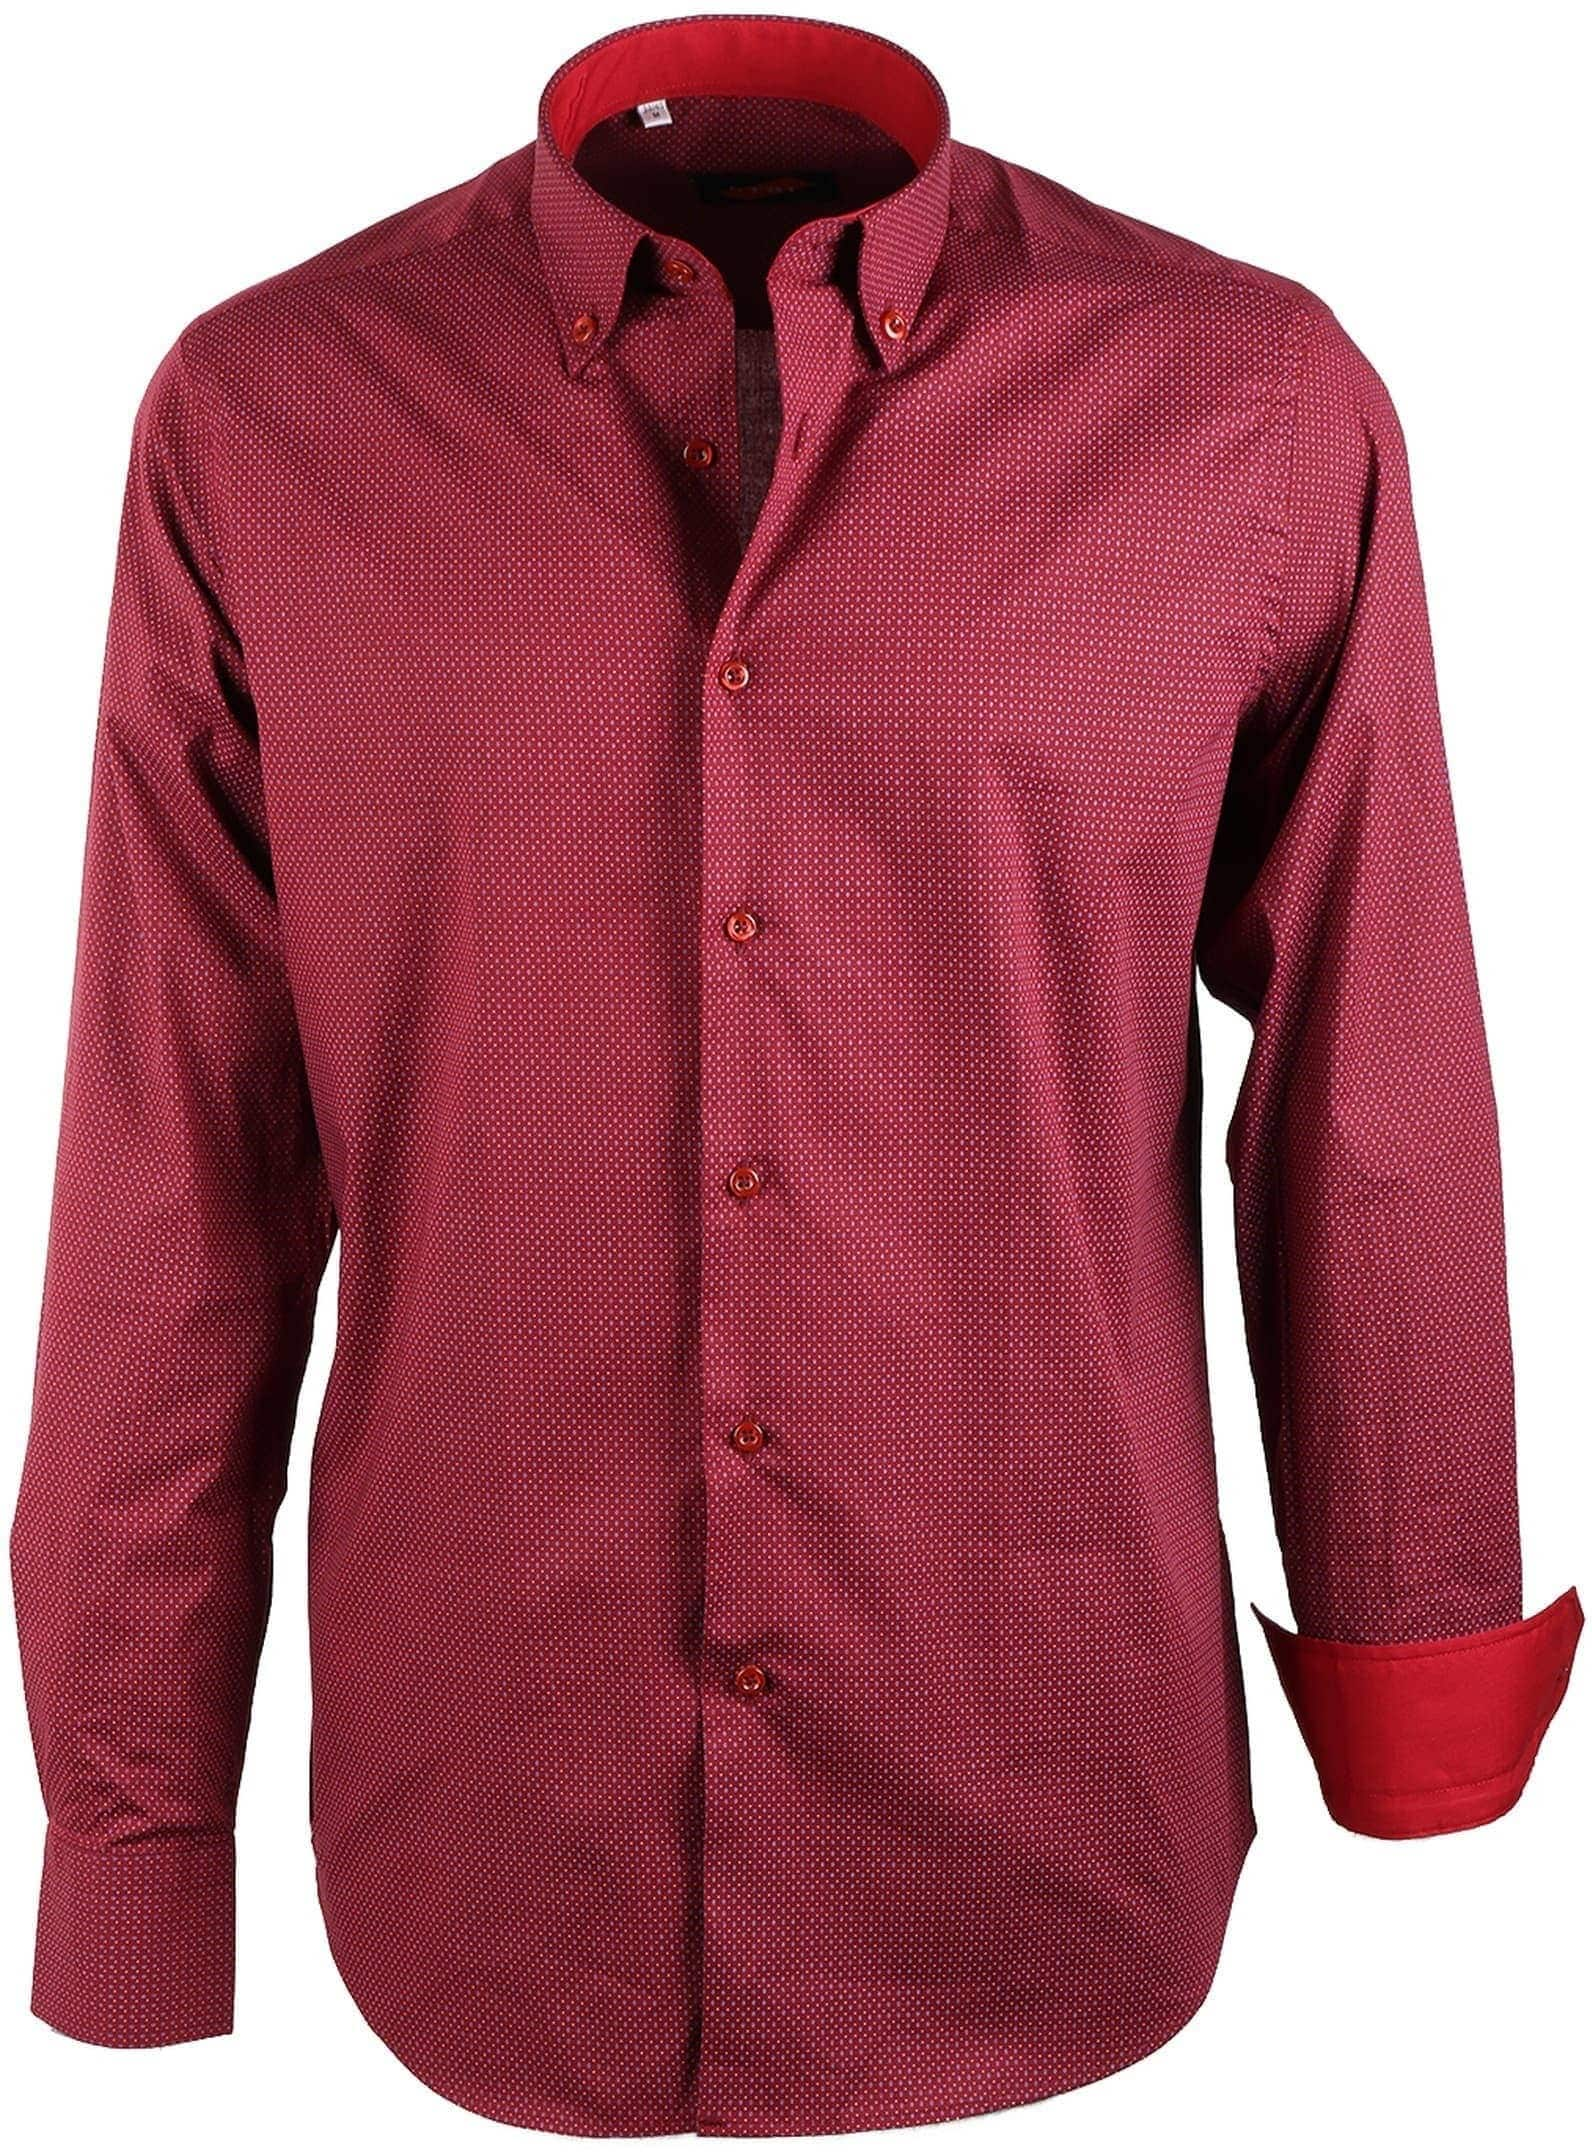 Bordeaux Overhemd.Casual Overhemd Bordeaux Print 2016 9001 5 Bordo Satin Print